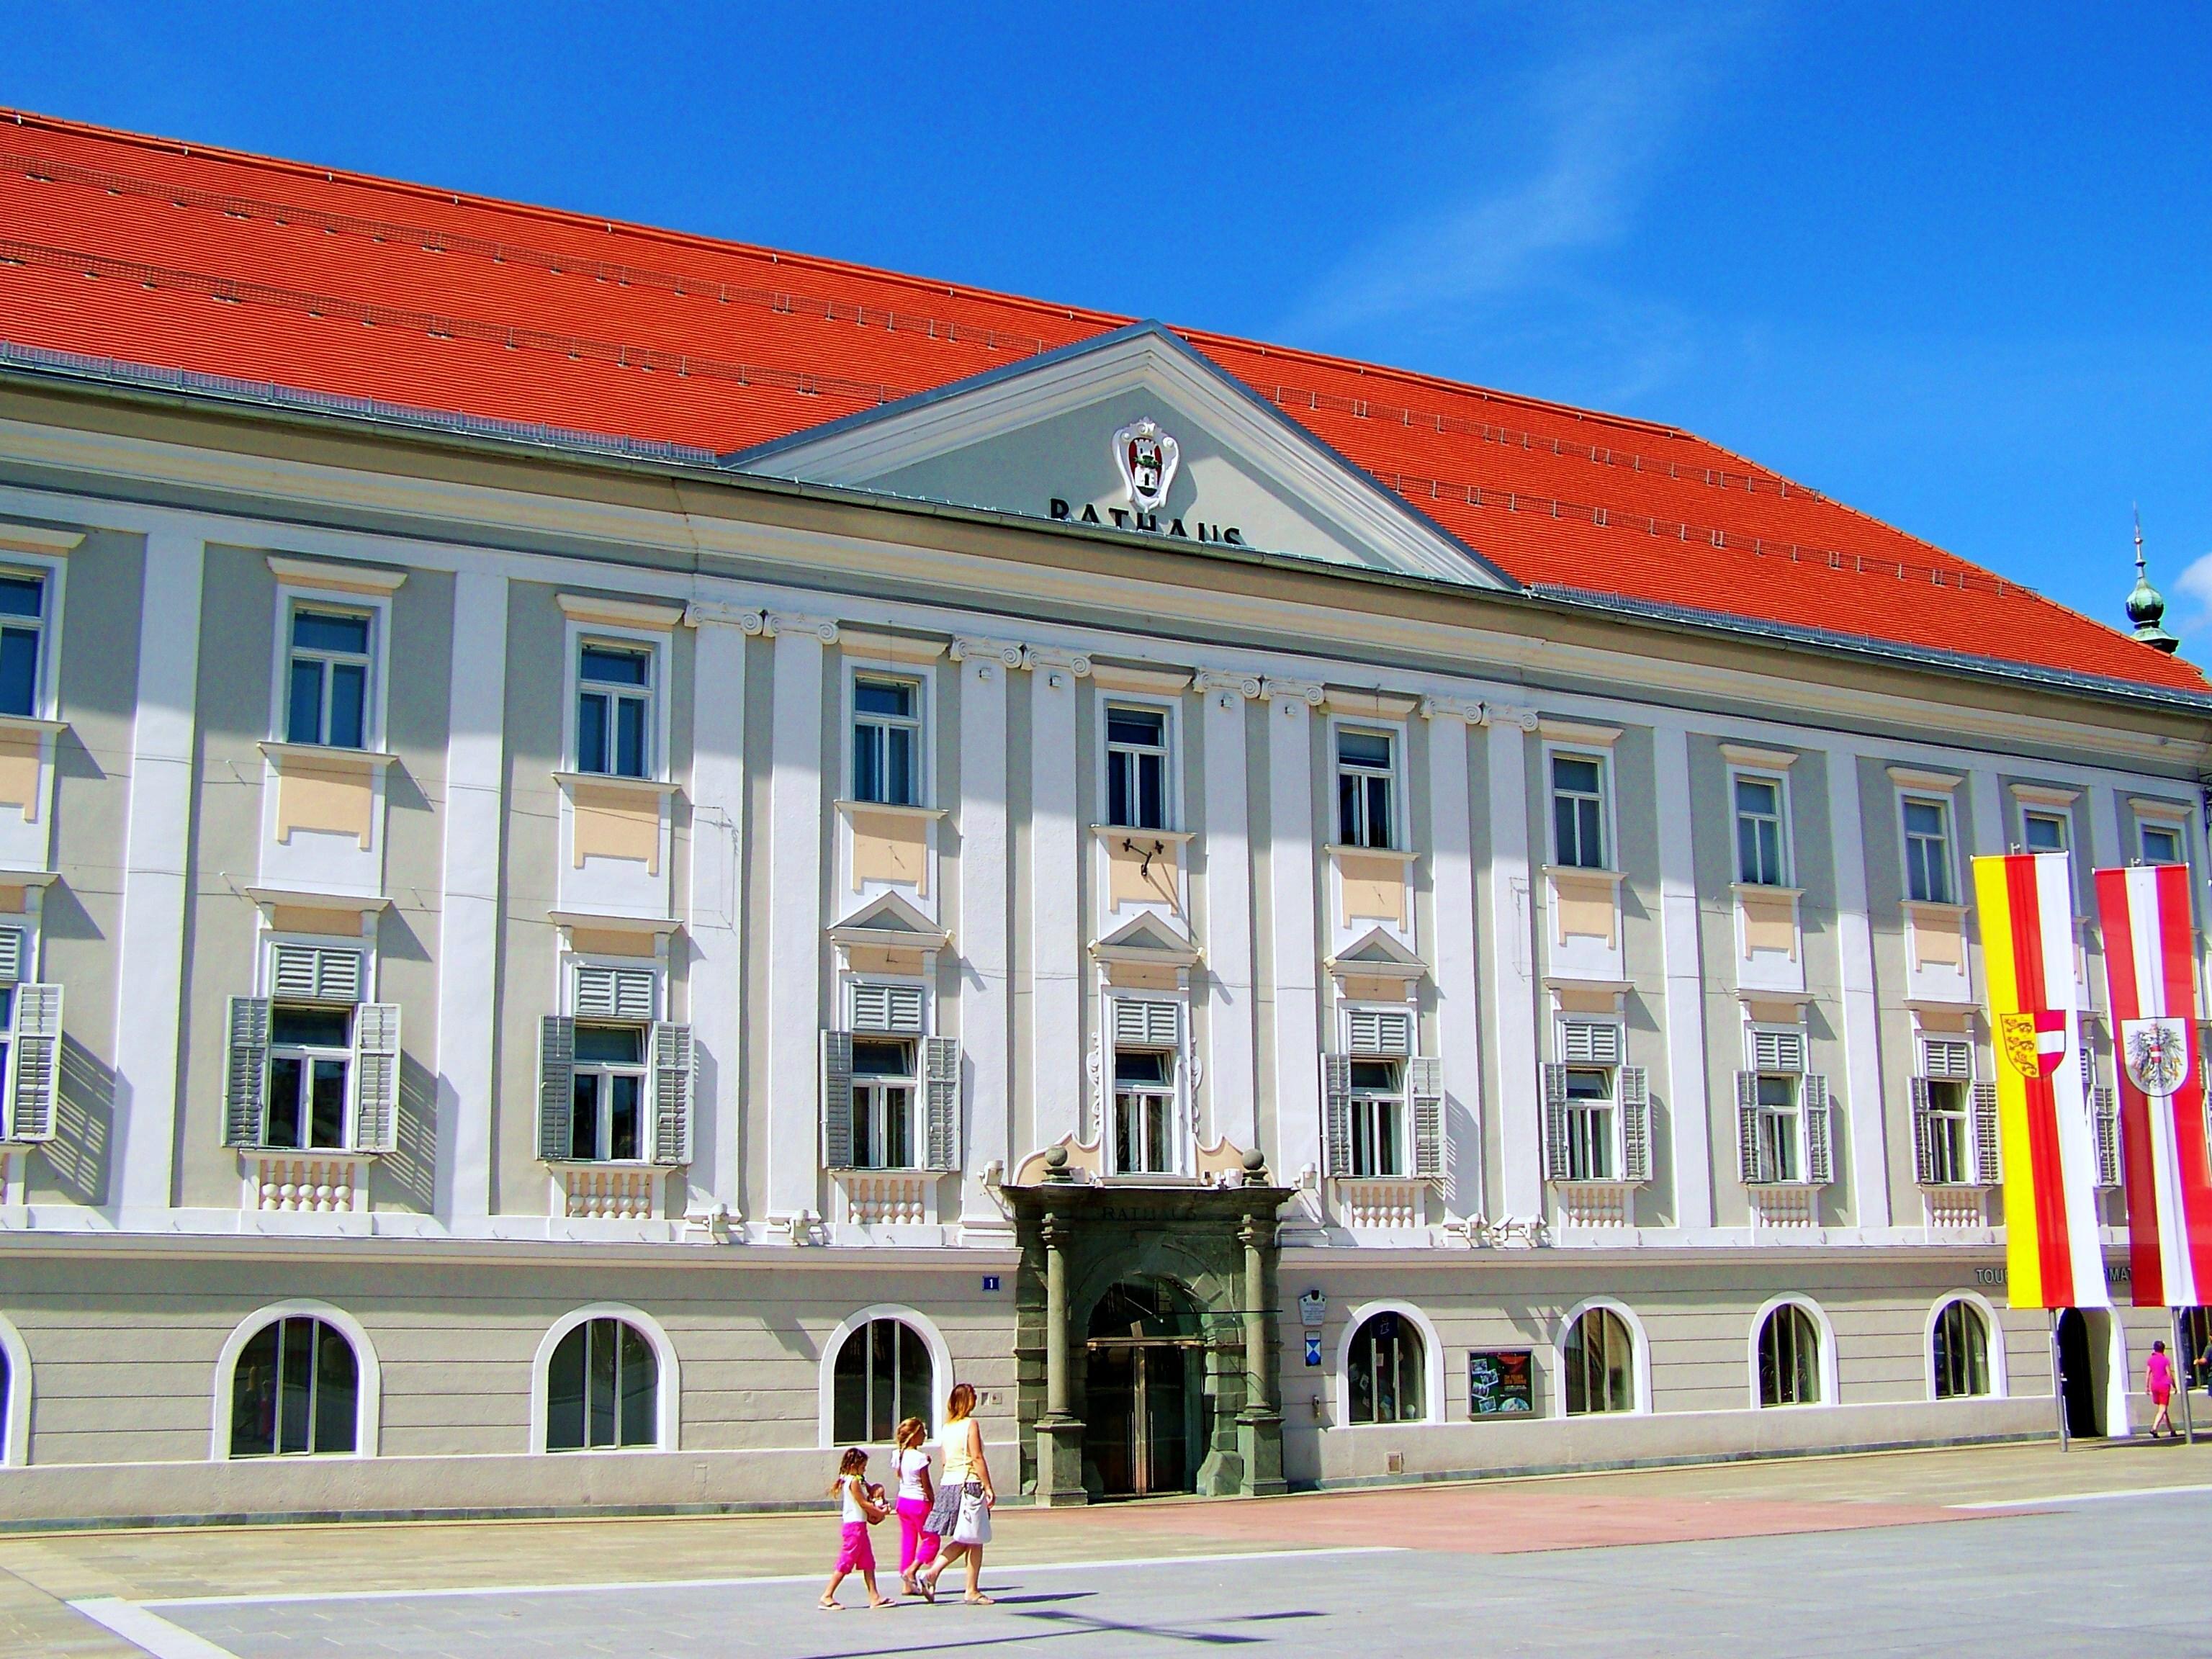 Klagenfurt dating